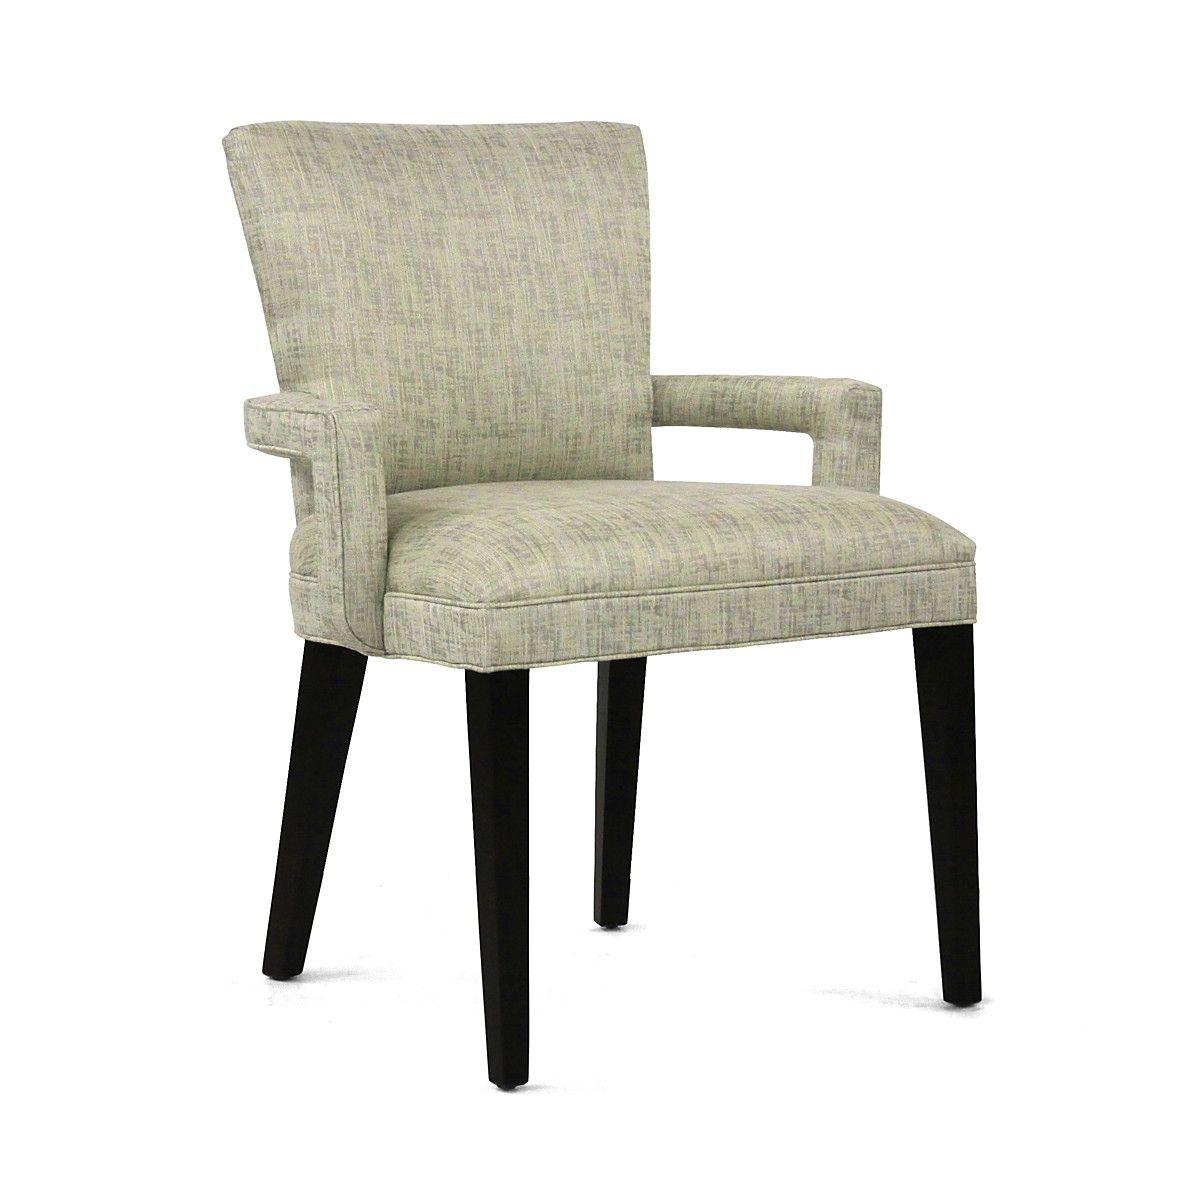 Mitchell Gold + Bob Williams Sydney Arm Chair | Church | Pinterest Inside Mitchell Arm Sofa Chairs (Image 17 of 25)